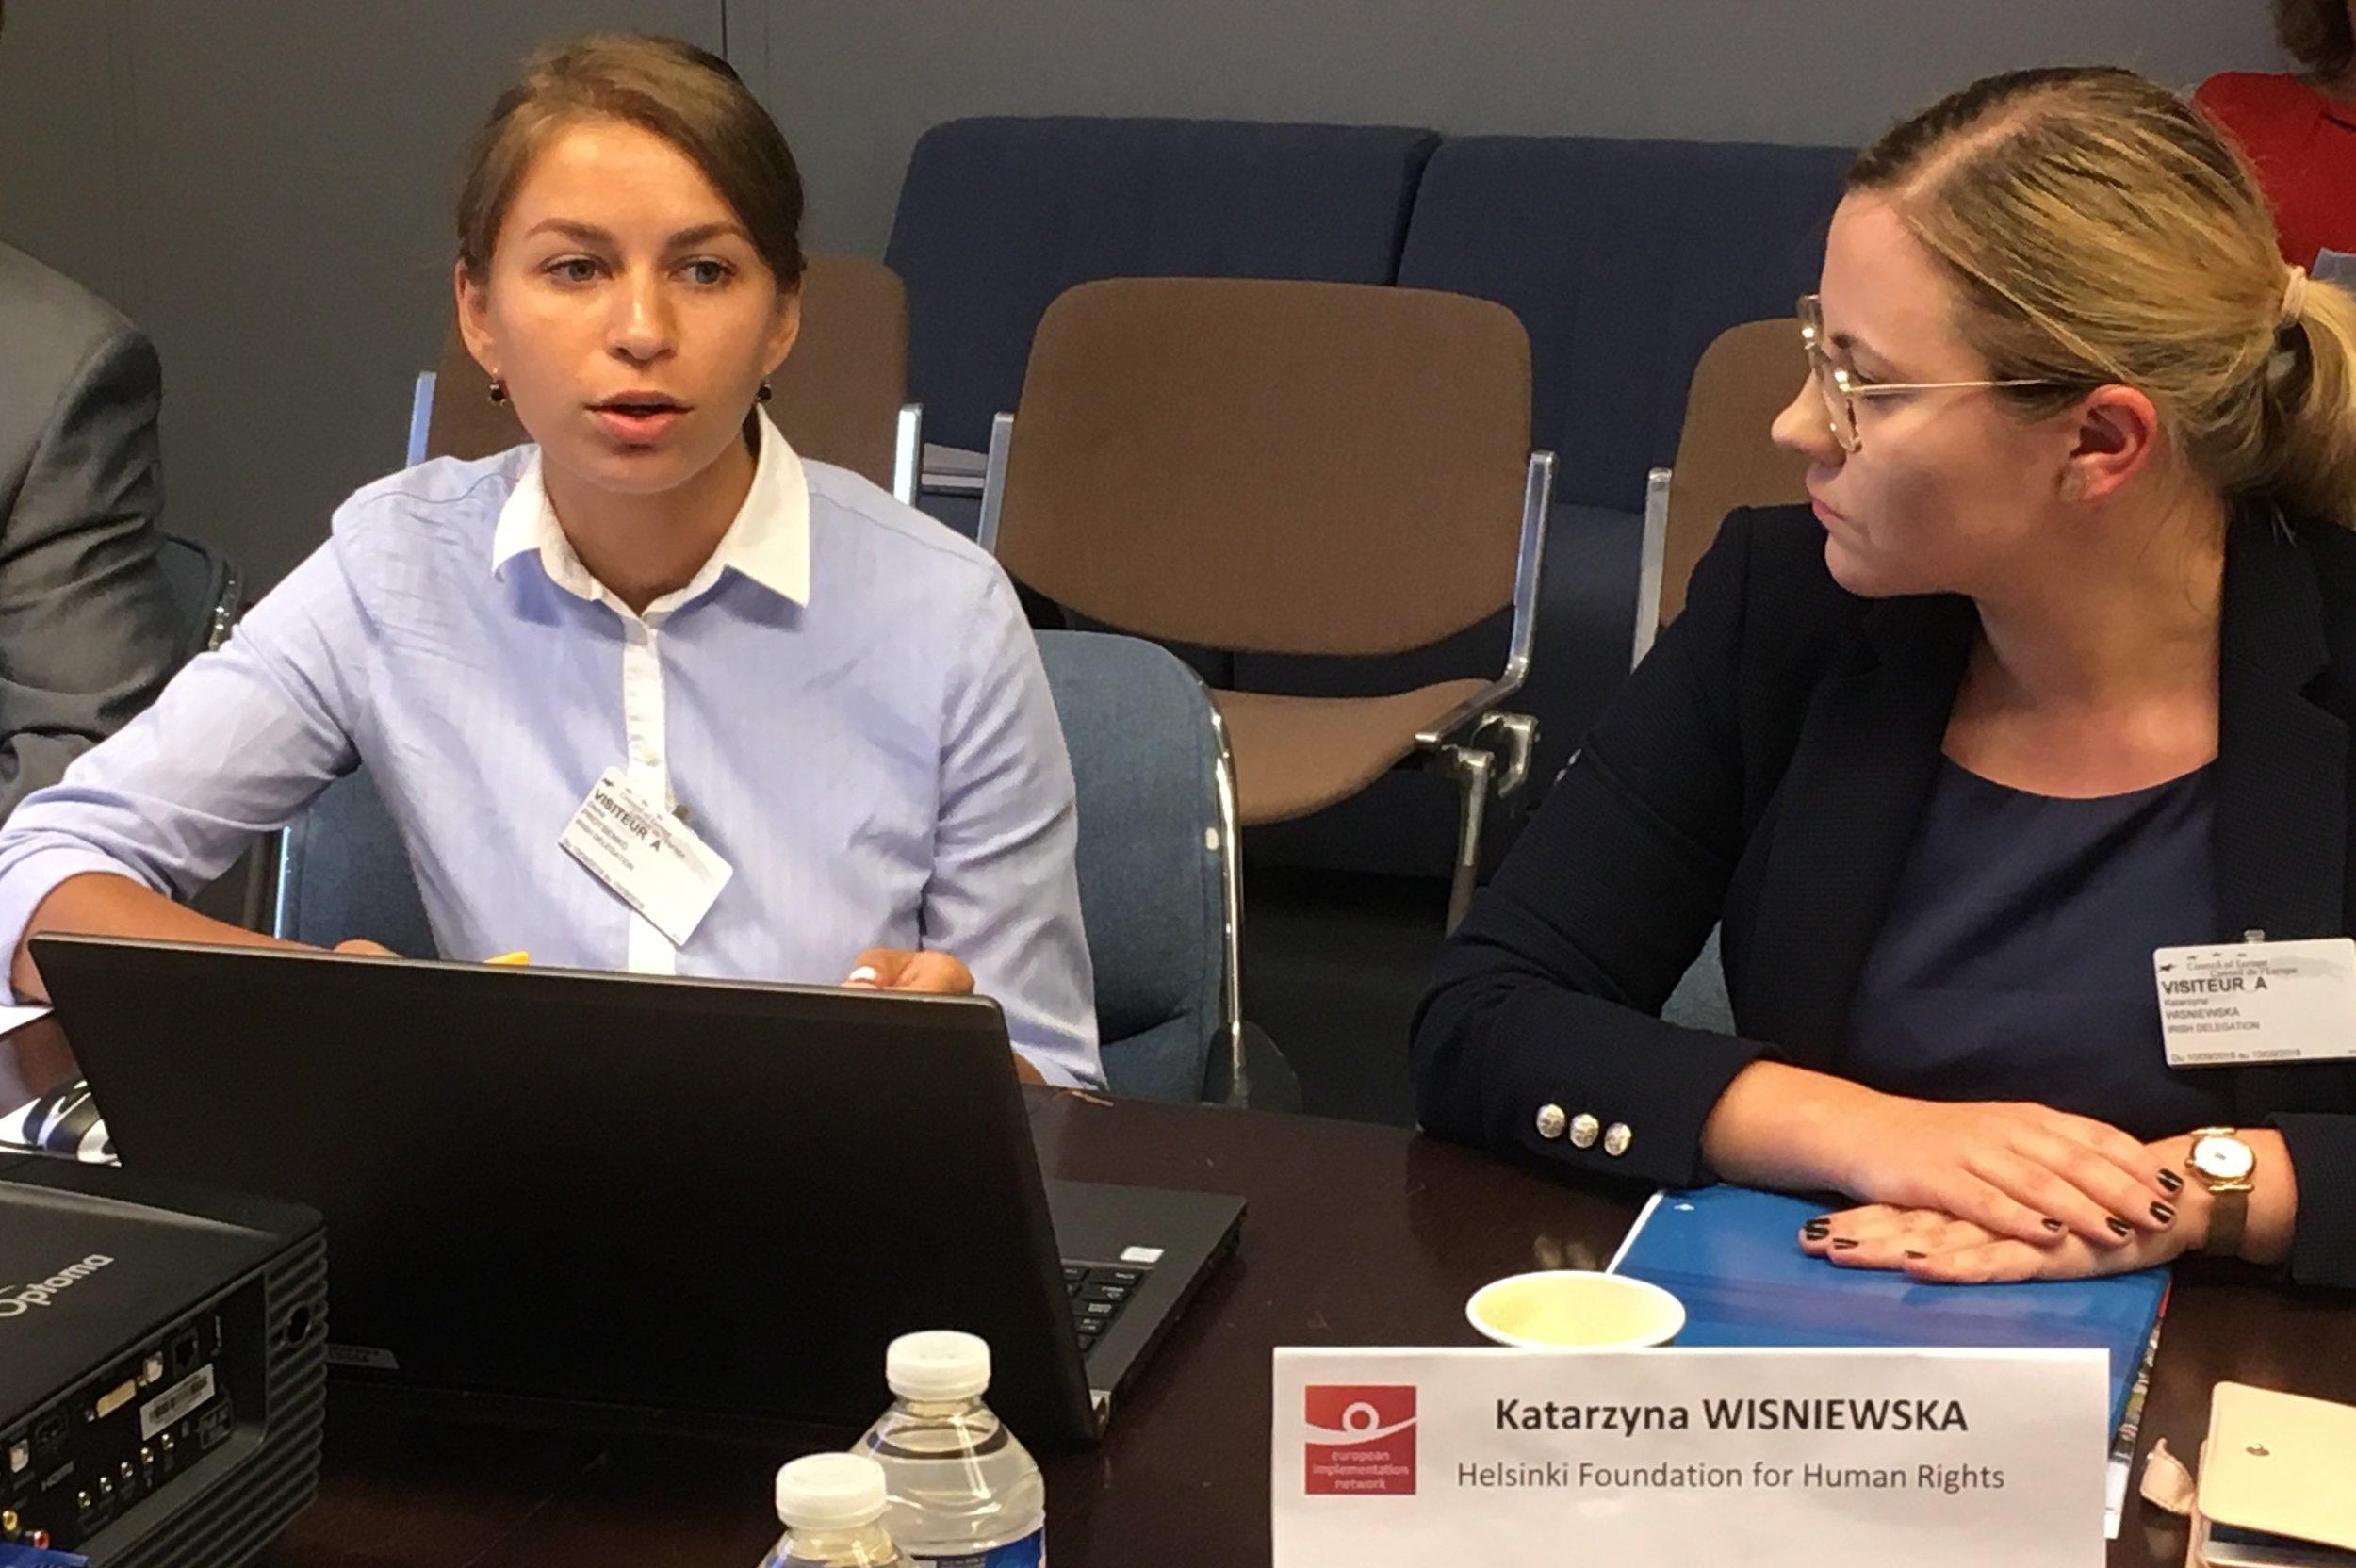 From left to right: Olena Protsenko (Ukrainian Helsinki Human Rights Union), speaking about the Gongadze case, and Katarzyna Wisniewska (Helsinki Foundation for Human Rights). Photo: EIN